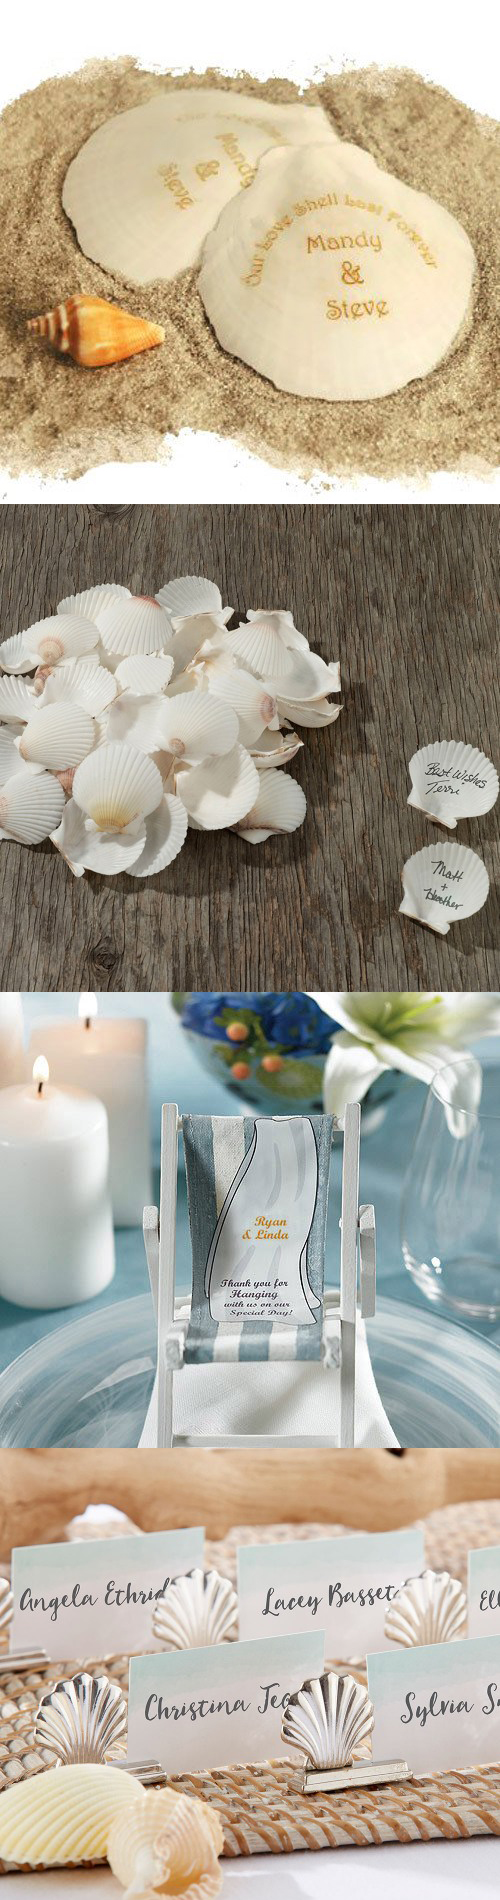 Gorgeous Beach Wedding Decoration  Favor Ideas for a Perfect